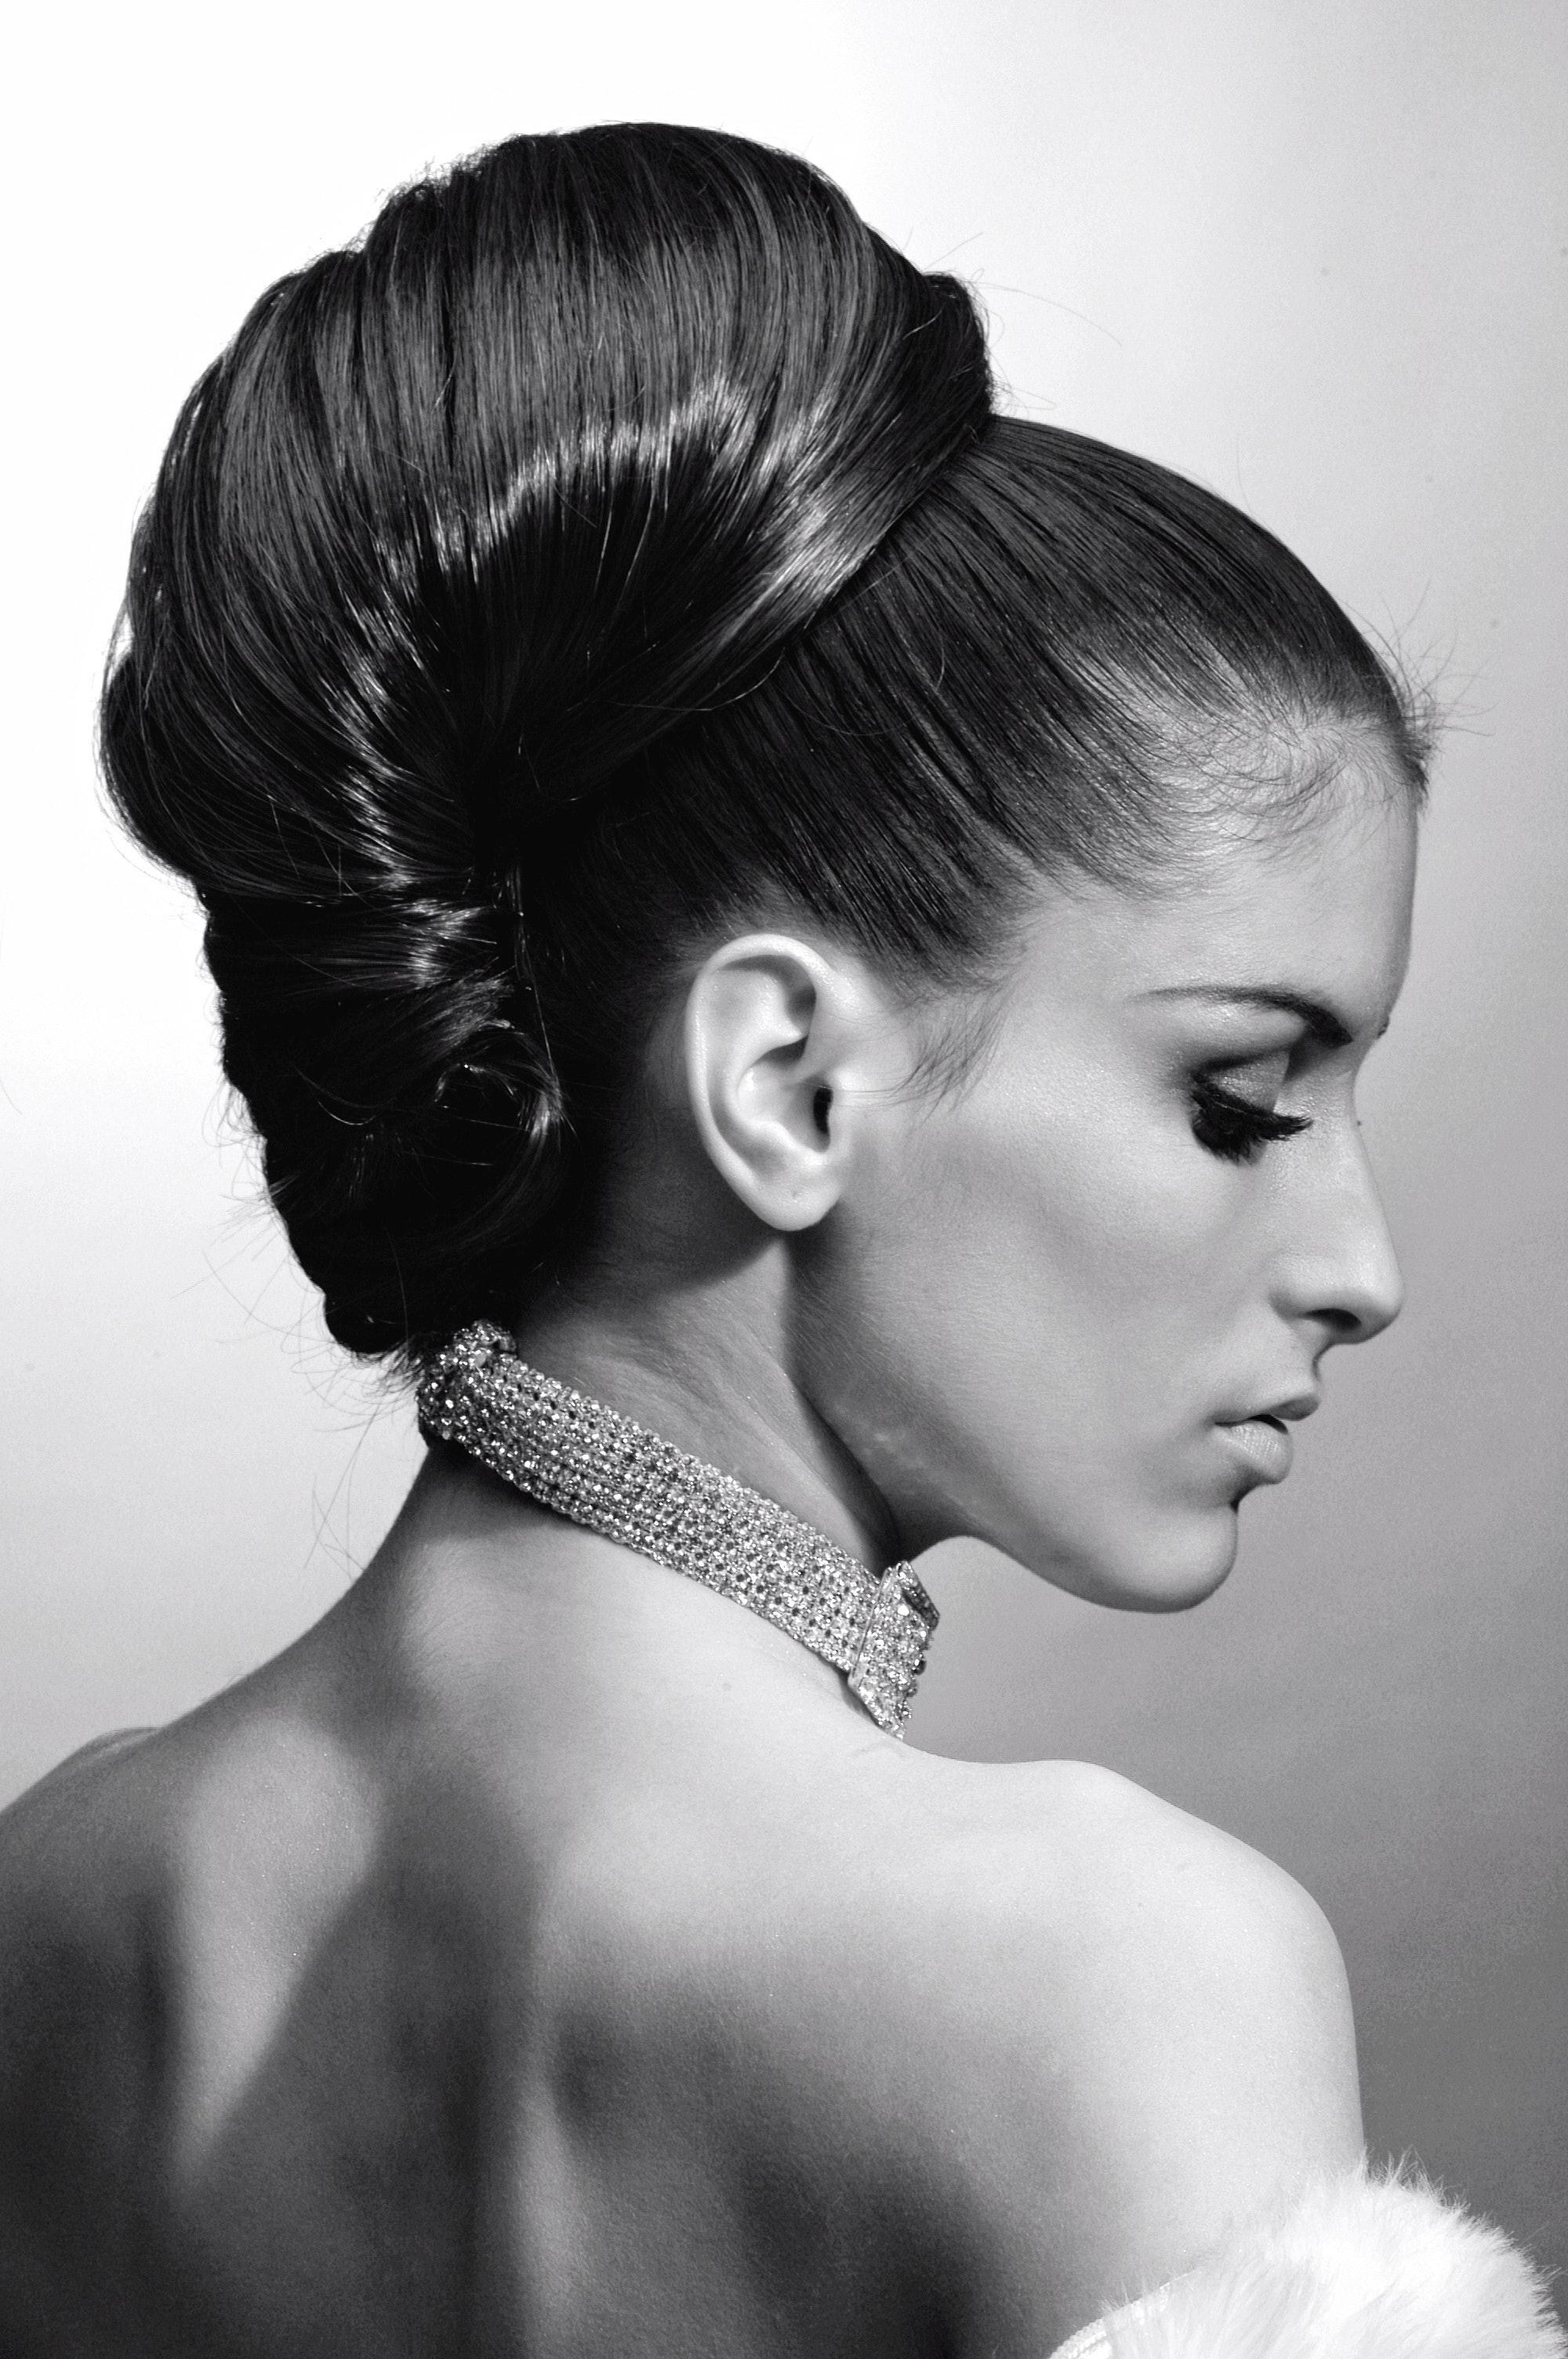 1000 Amazing Hairstyle Photos Pexels Free Stock Photos